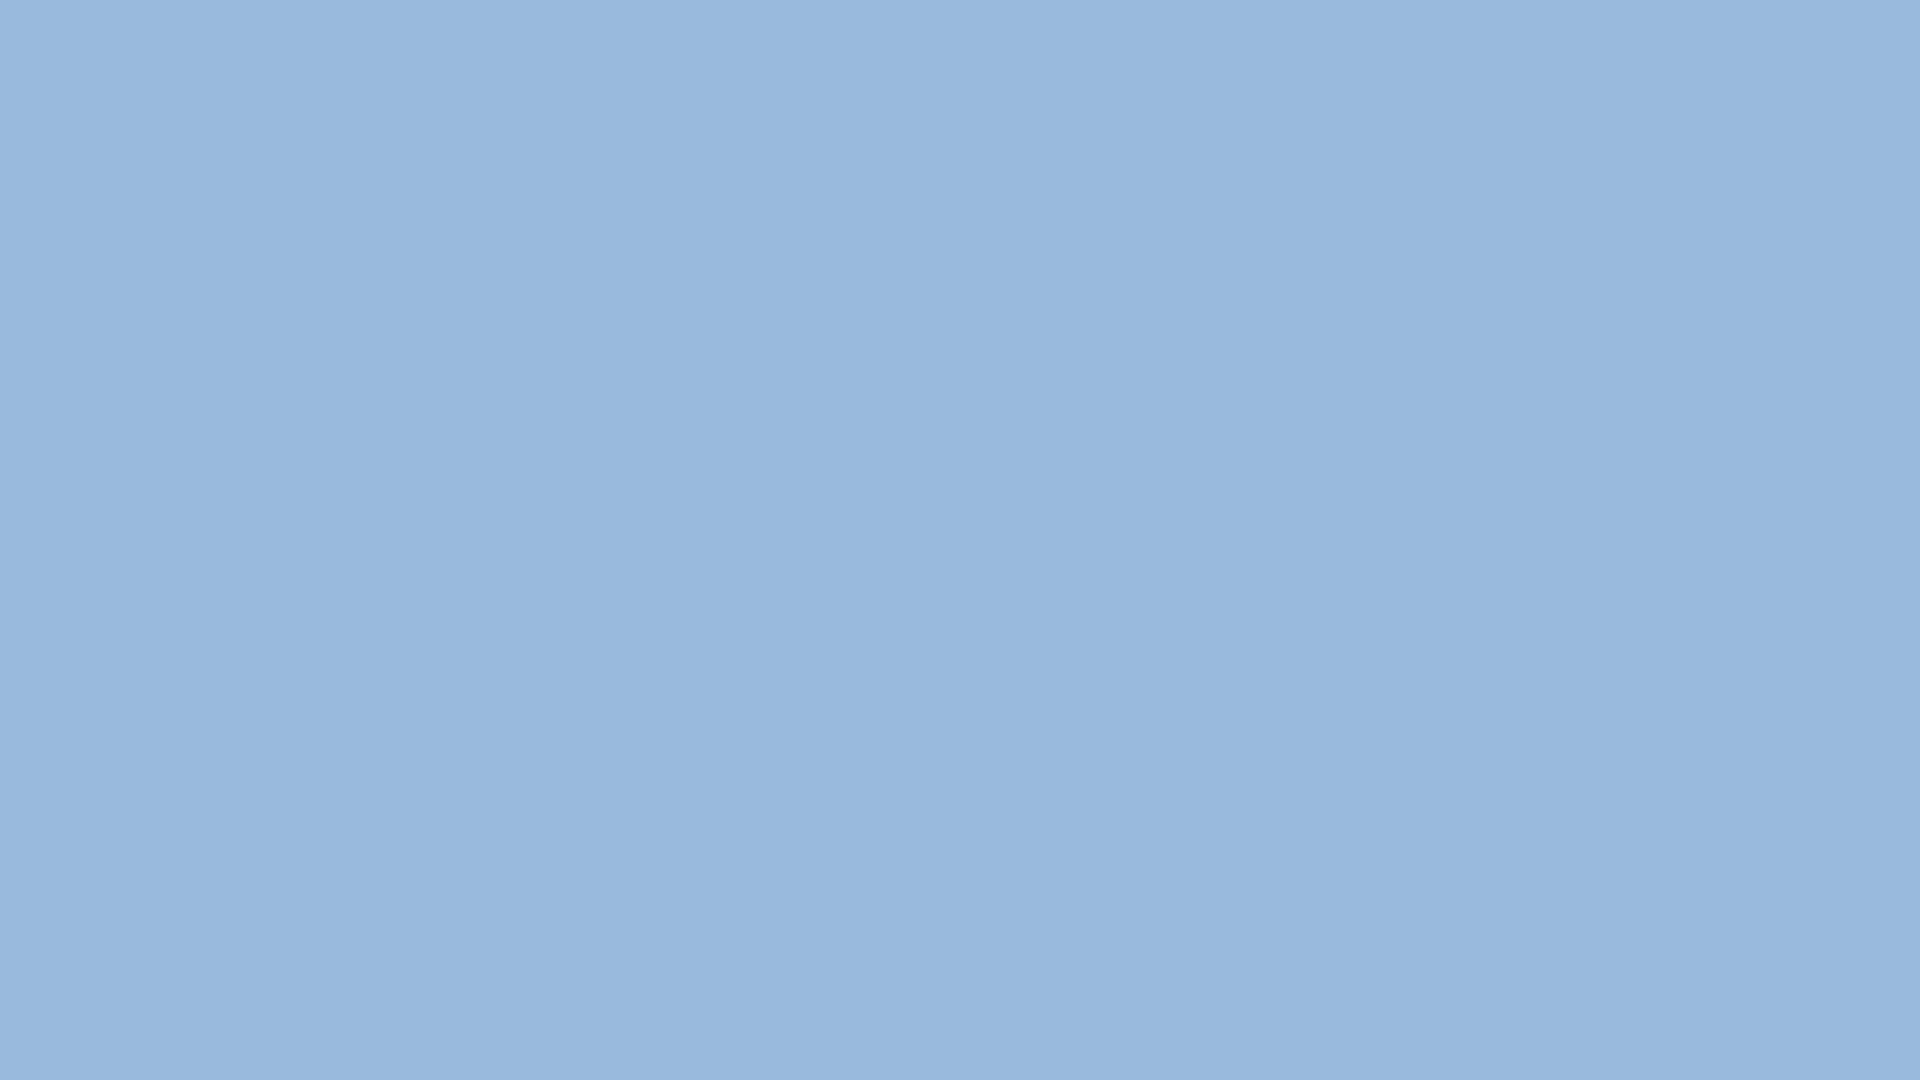 Most Cute Wallpaper Carolina Blue Wallpaper High Definition High Quality